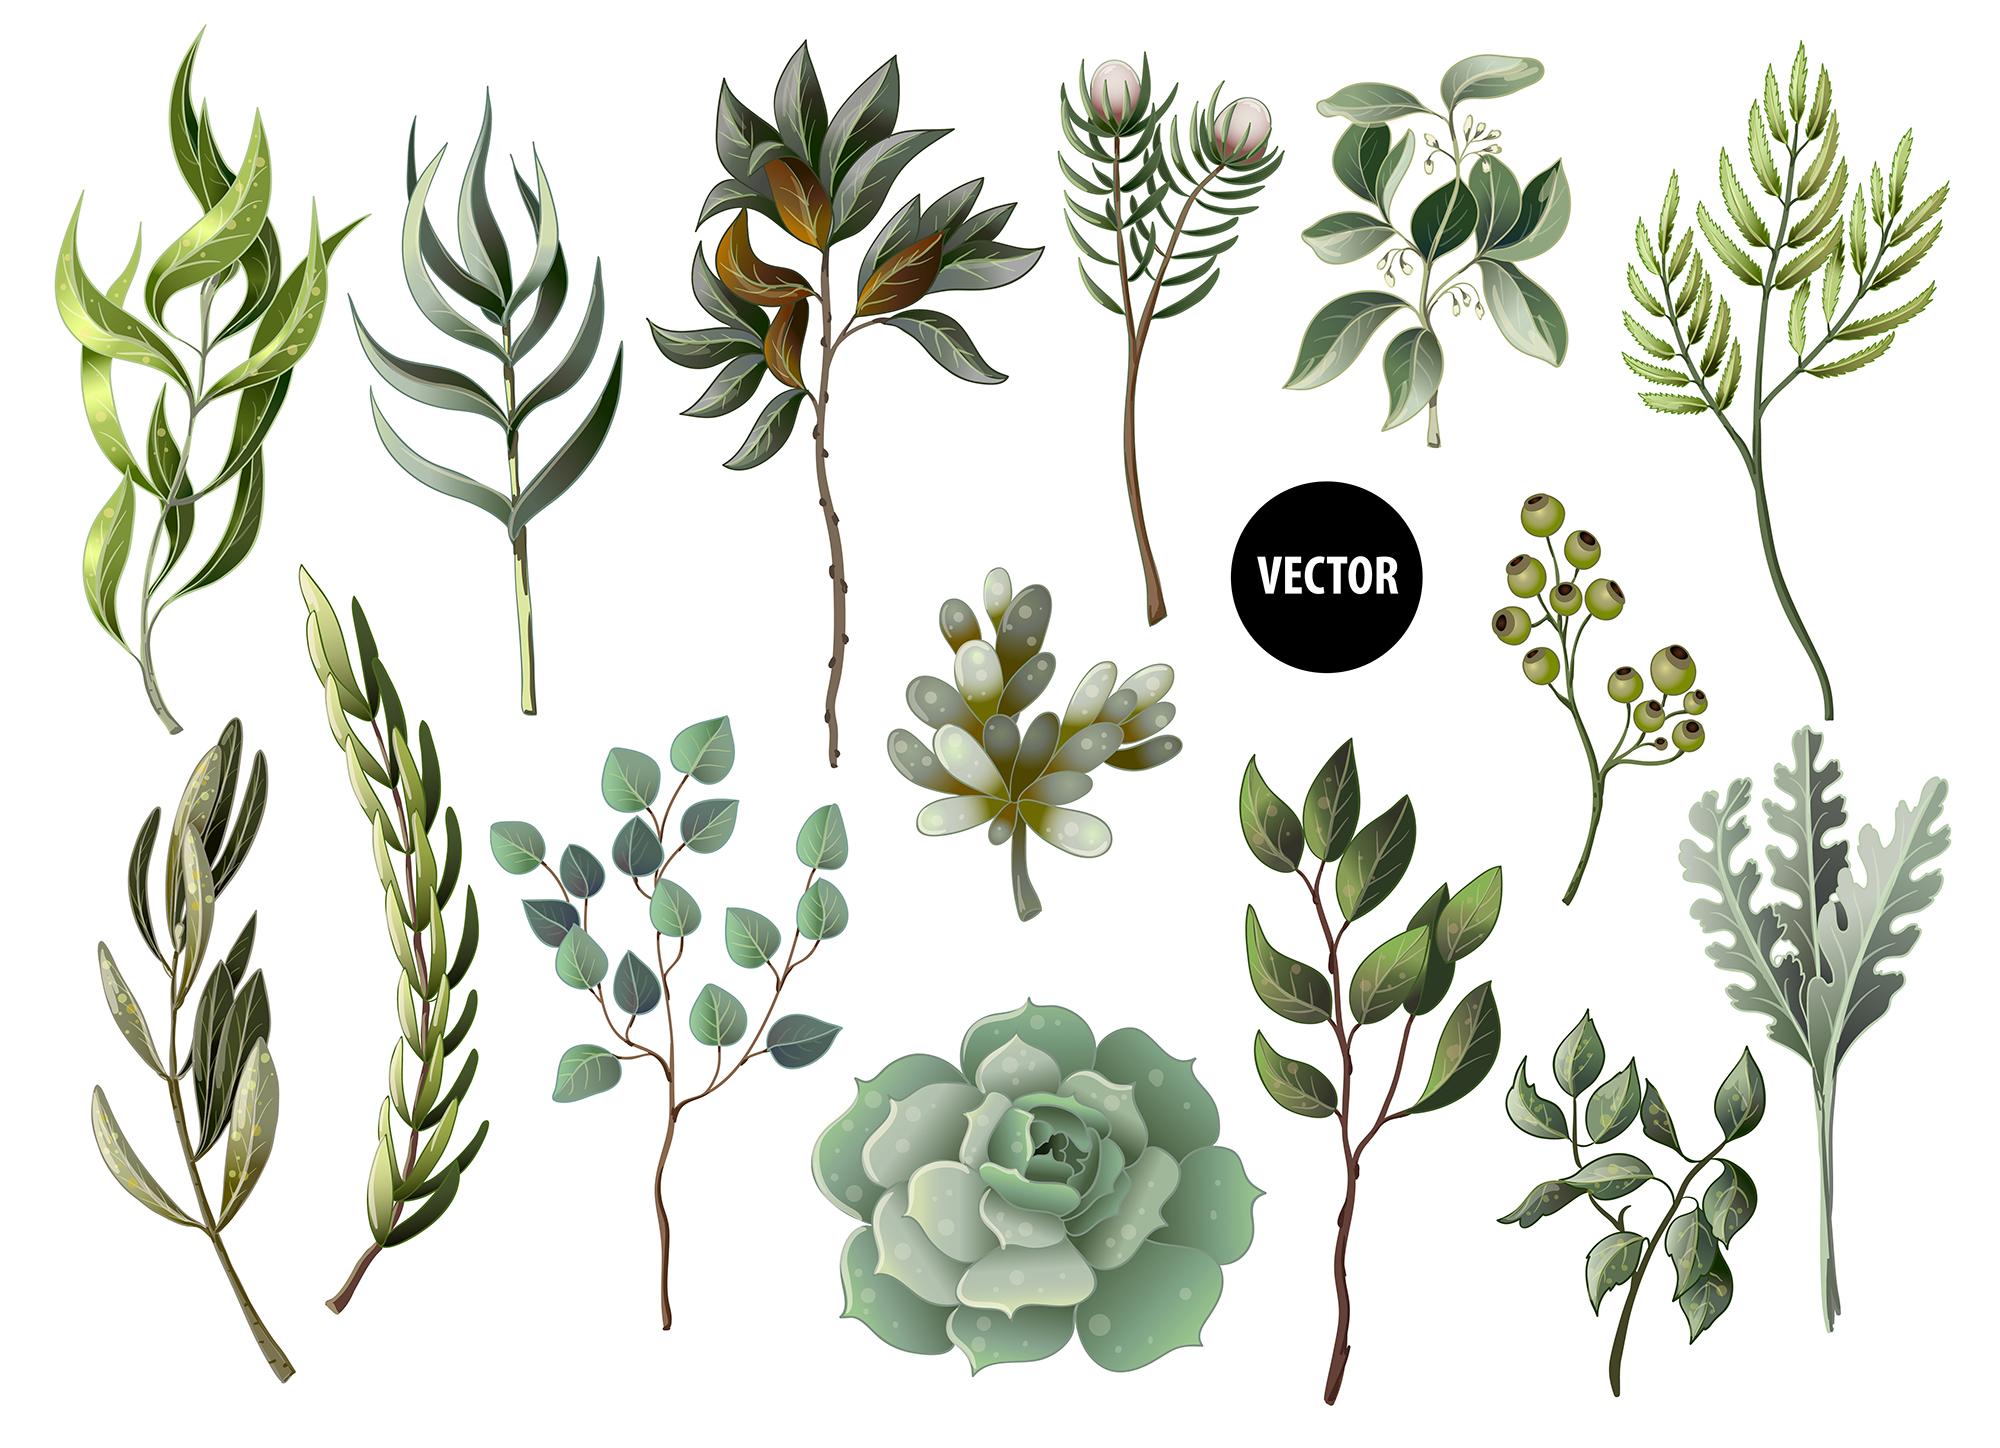 Wedding greenery invitation, patterns and isolated elements example image 2